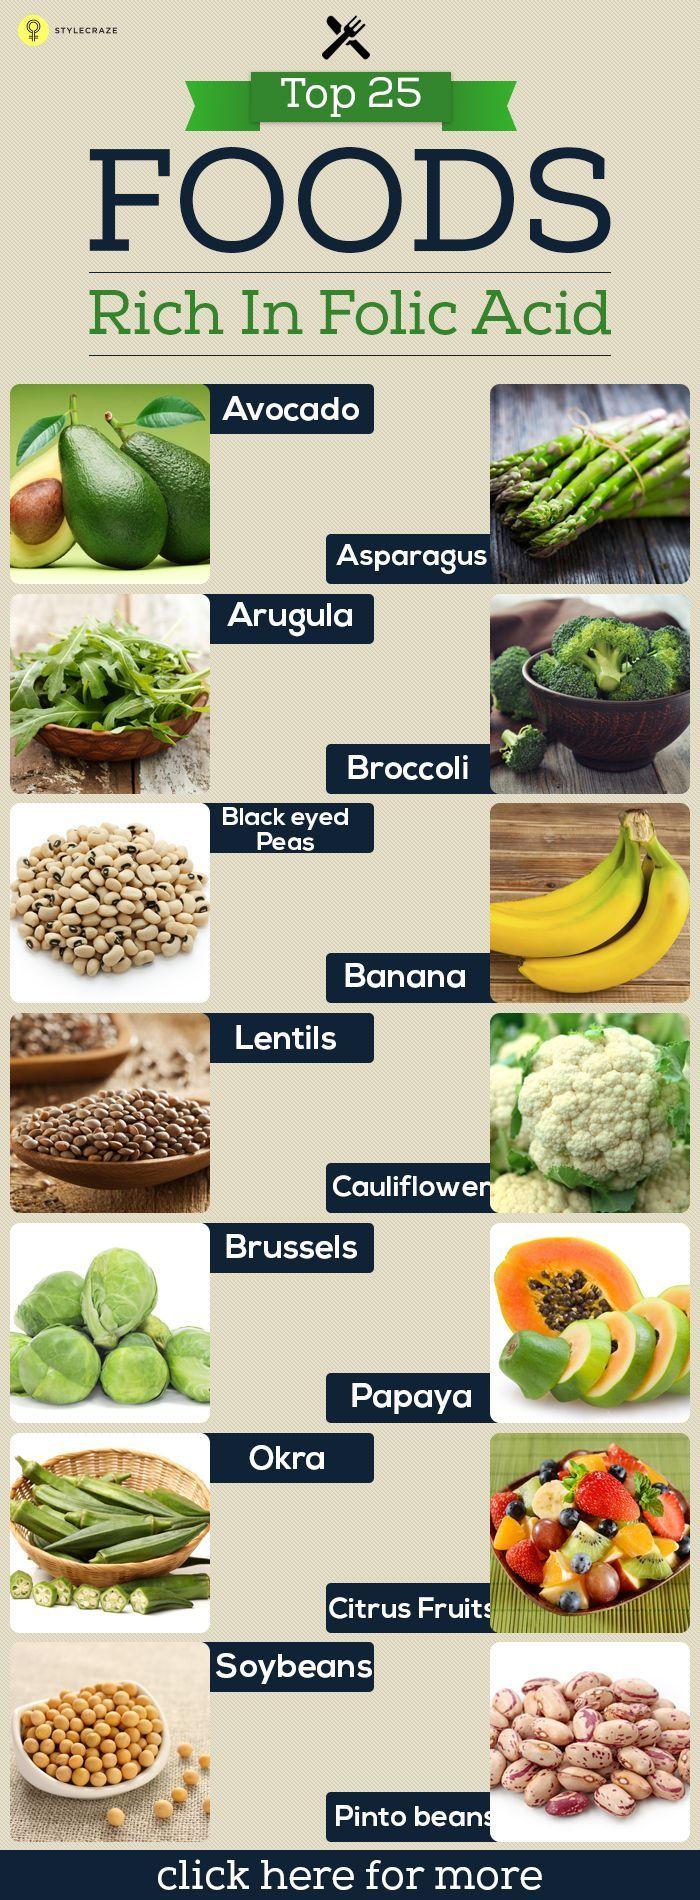 What is folic acid? 29